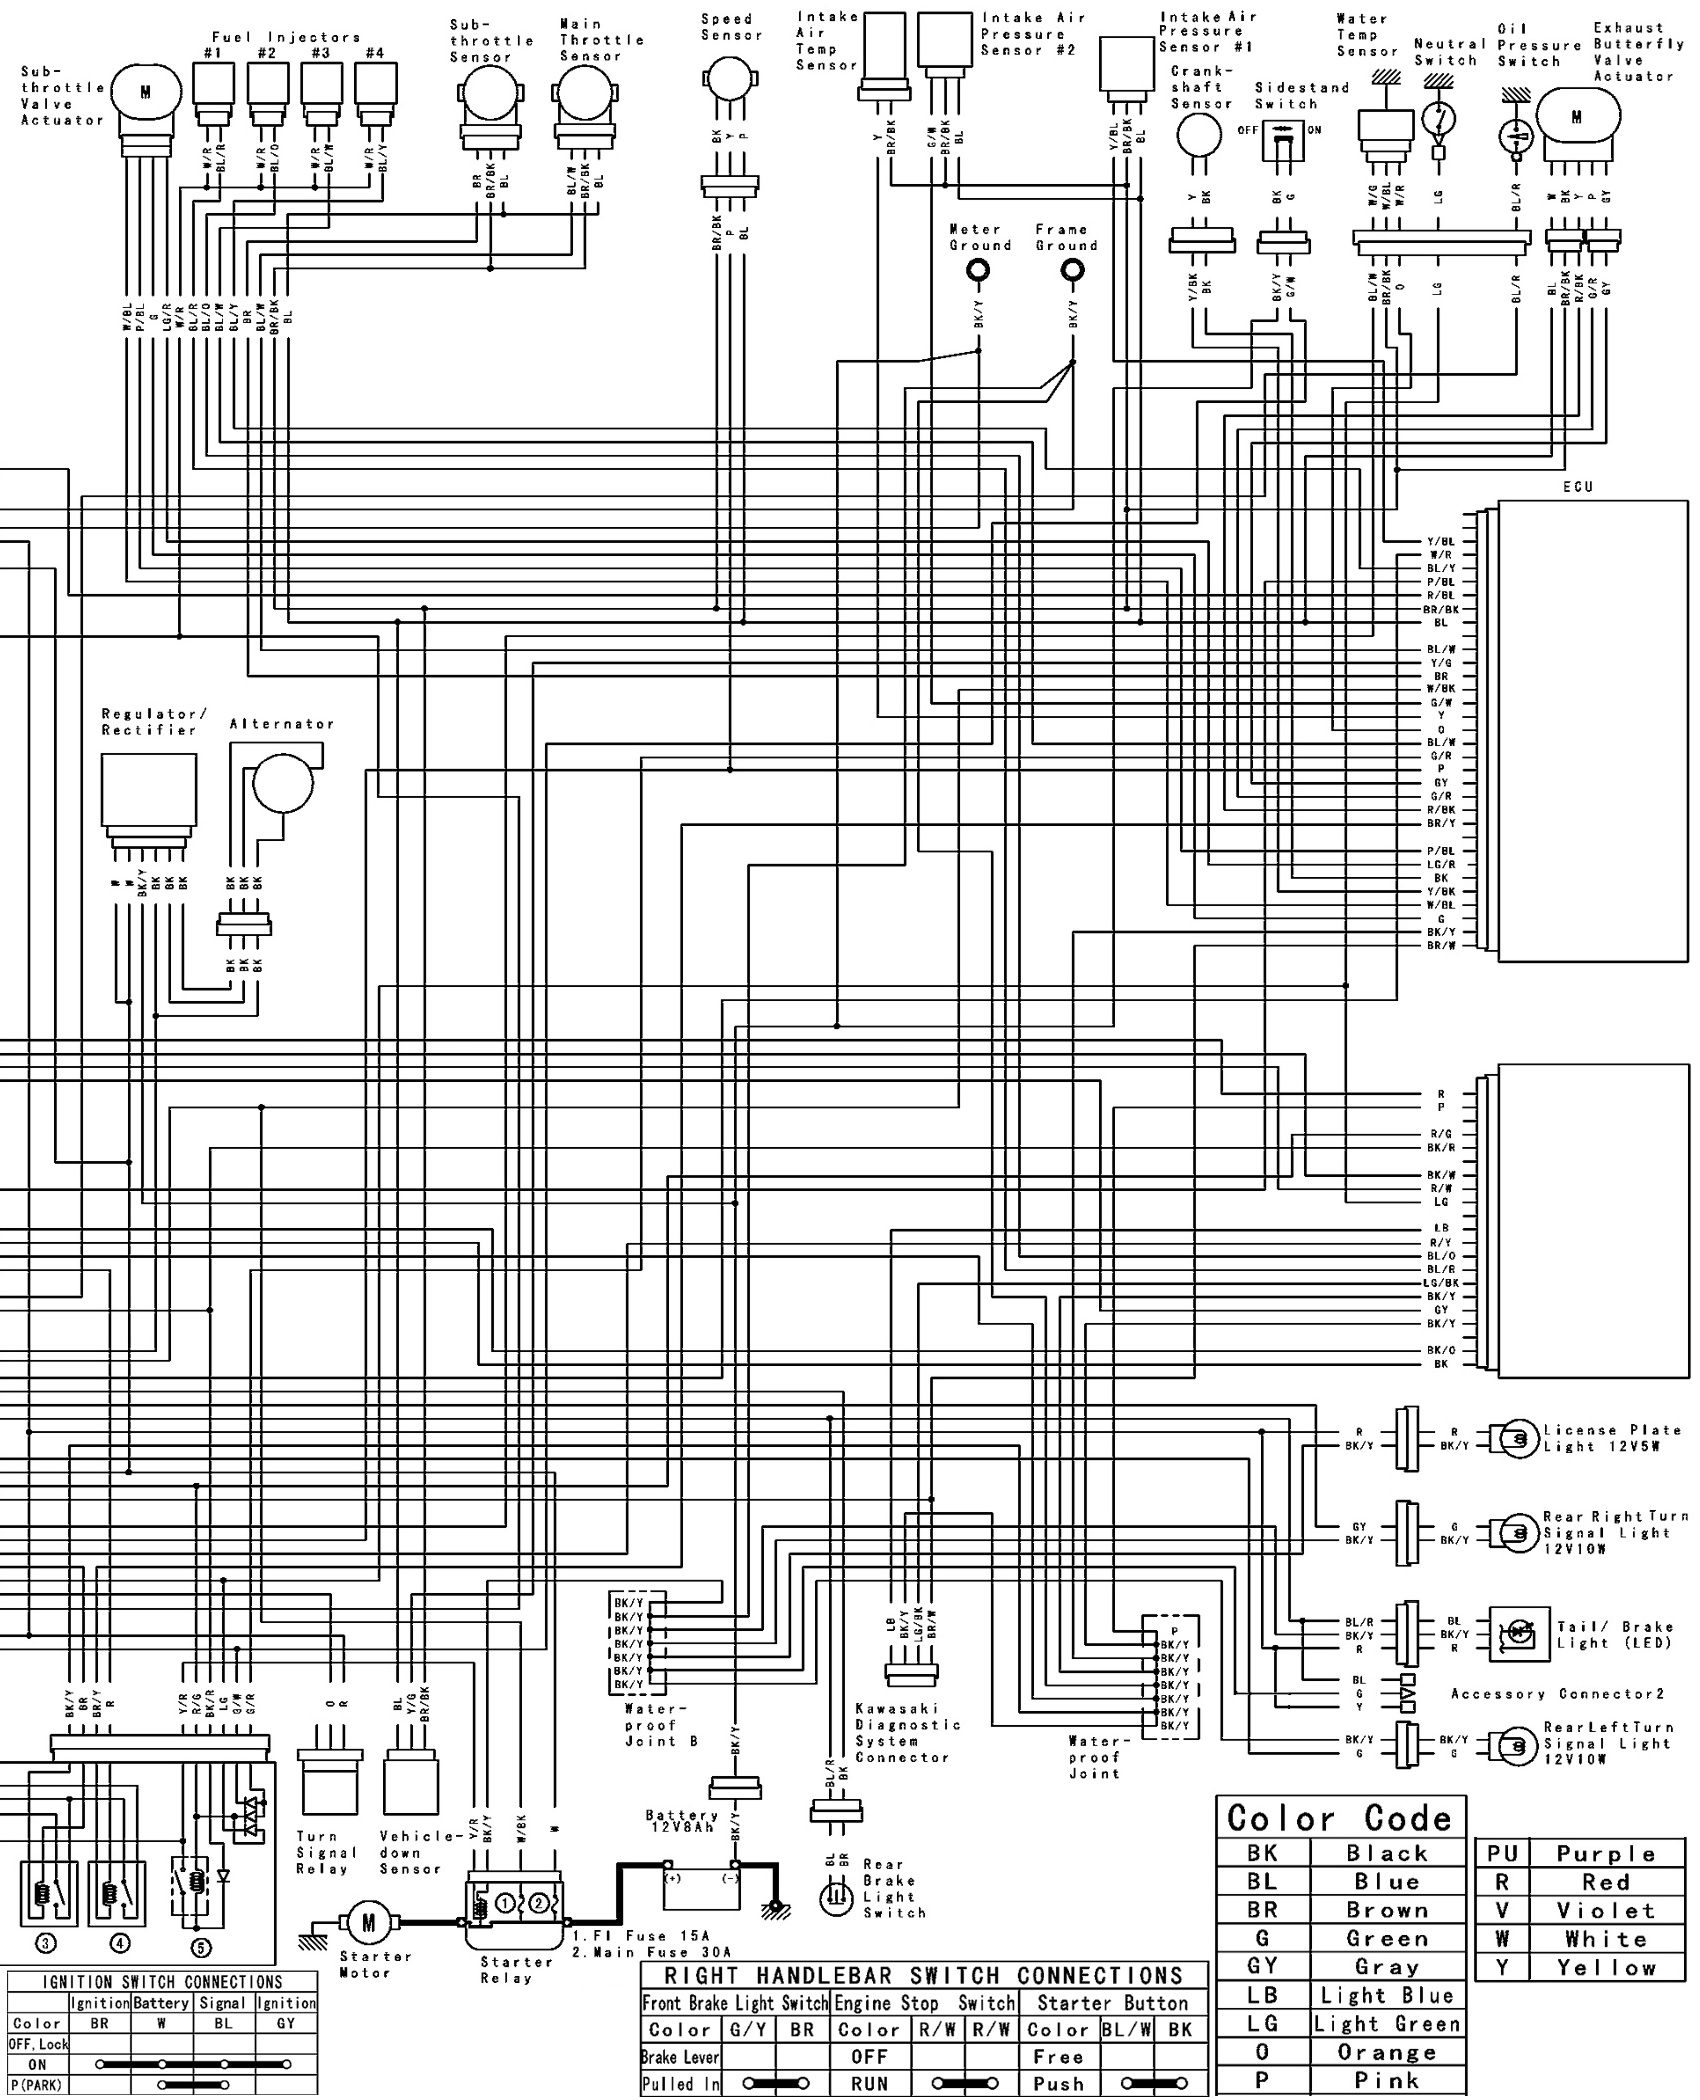 Wiring diagram anyone? | RiderForums.com - Kawasaki Motorcycle ForumRider forum